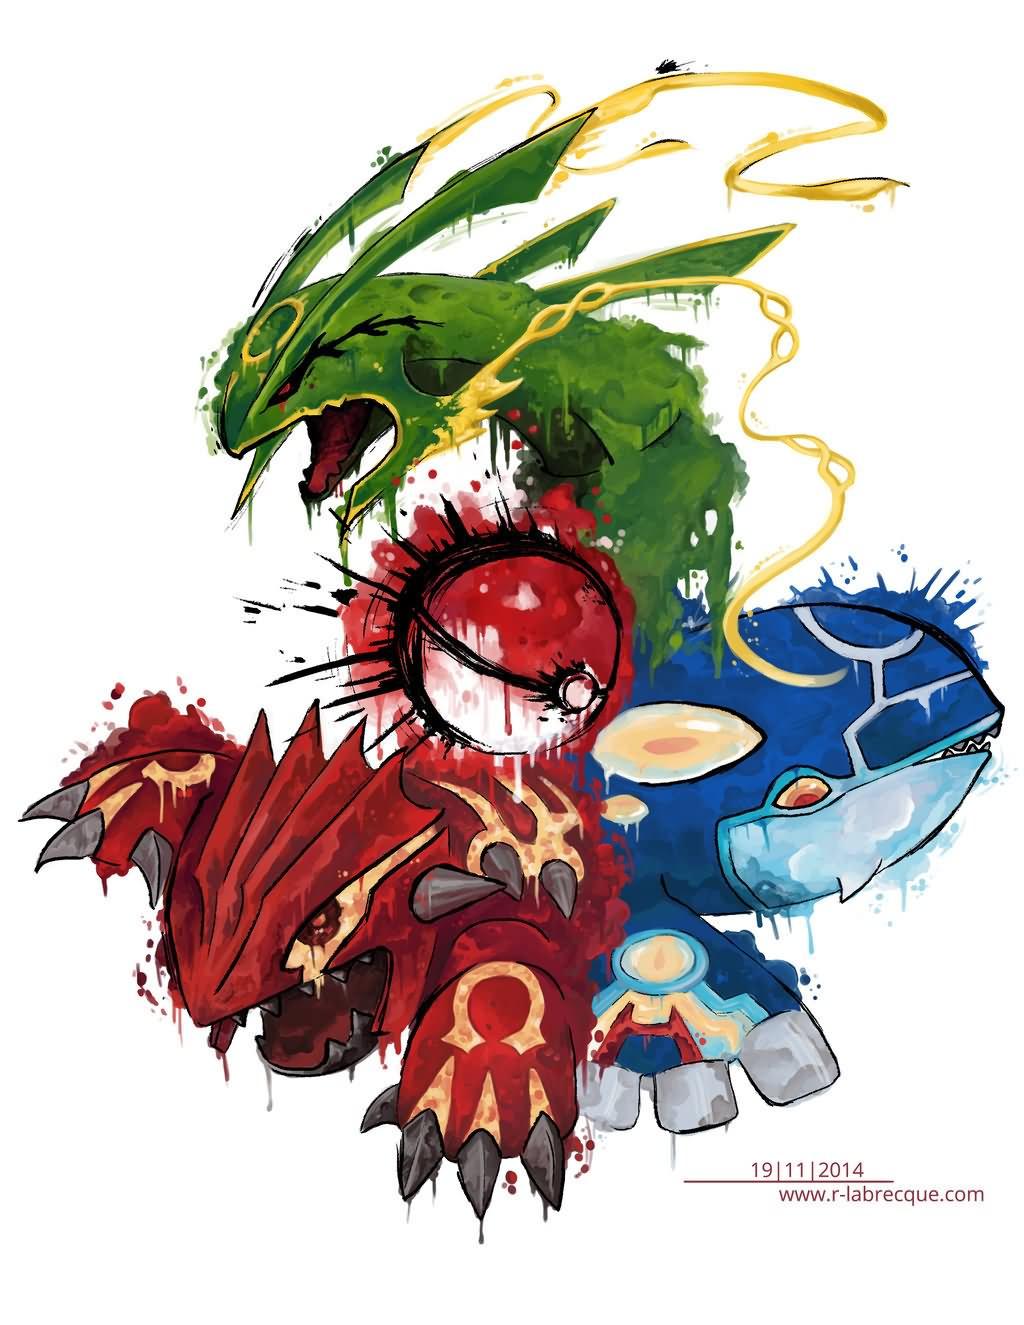 Gallery For gt Legendary Pokemon Tattoo